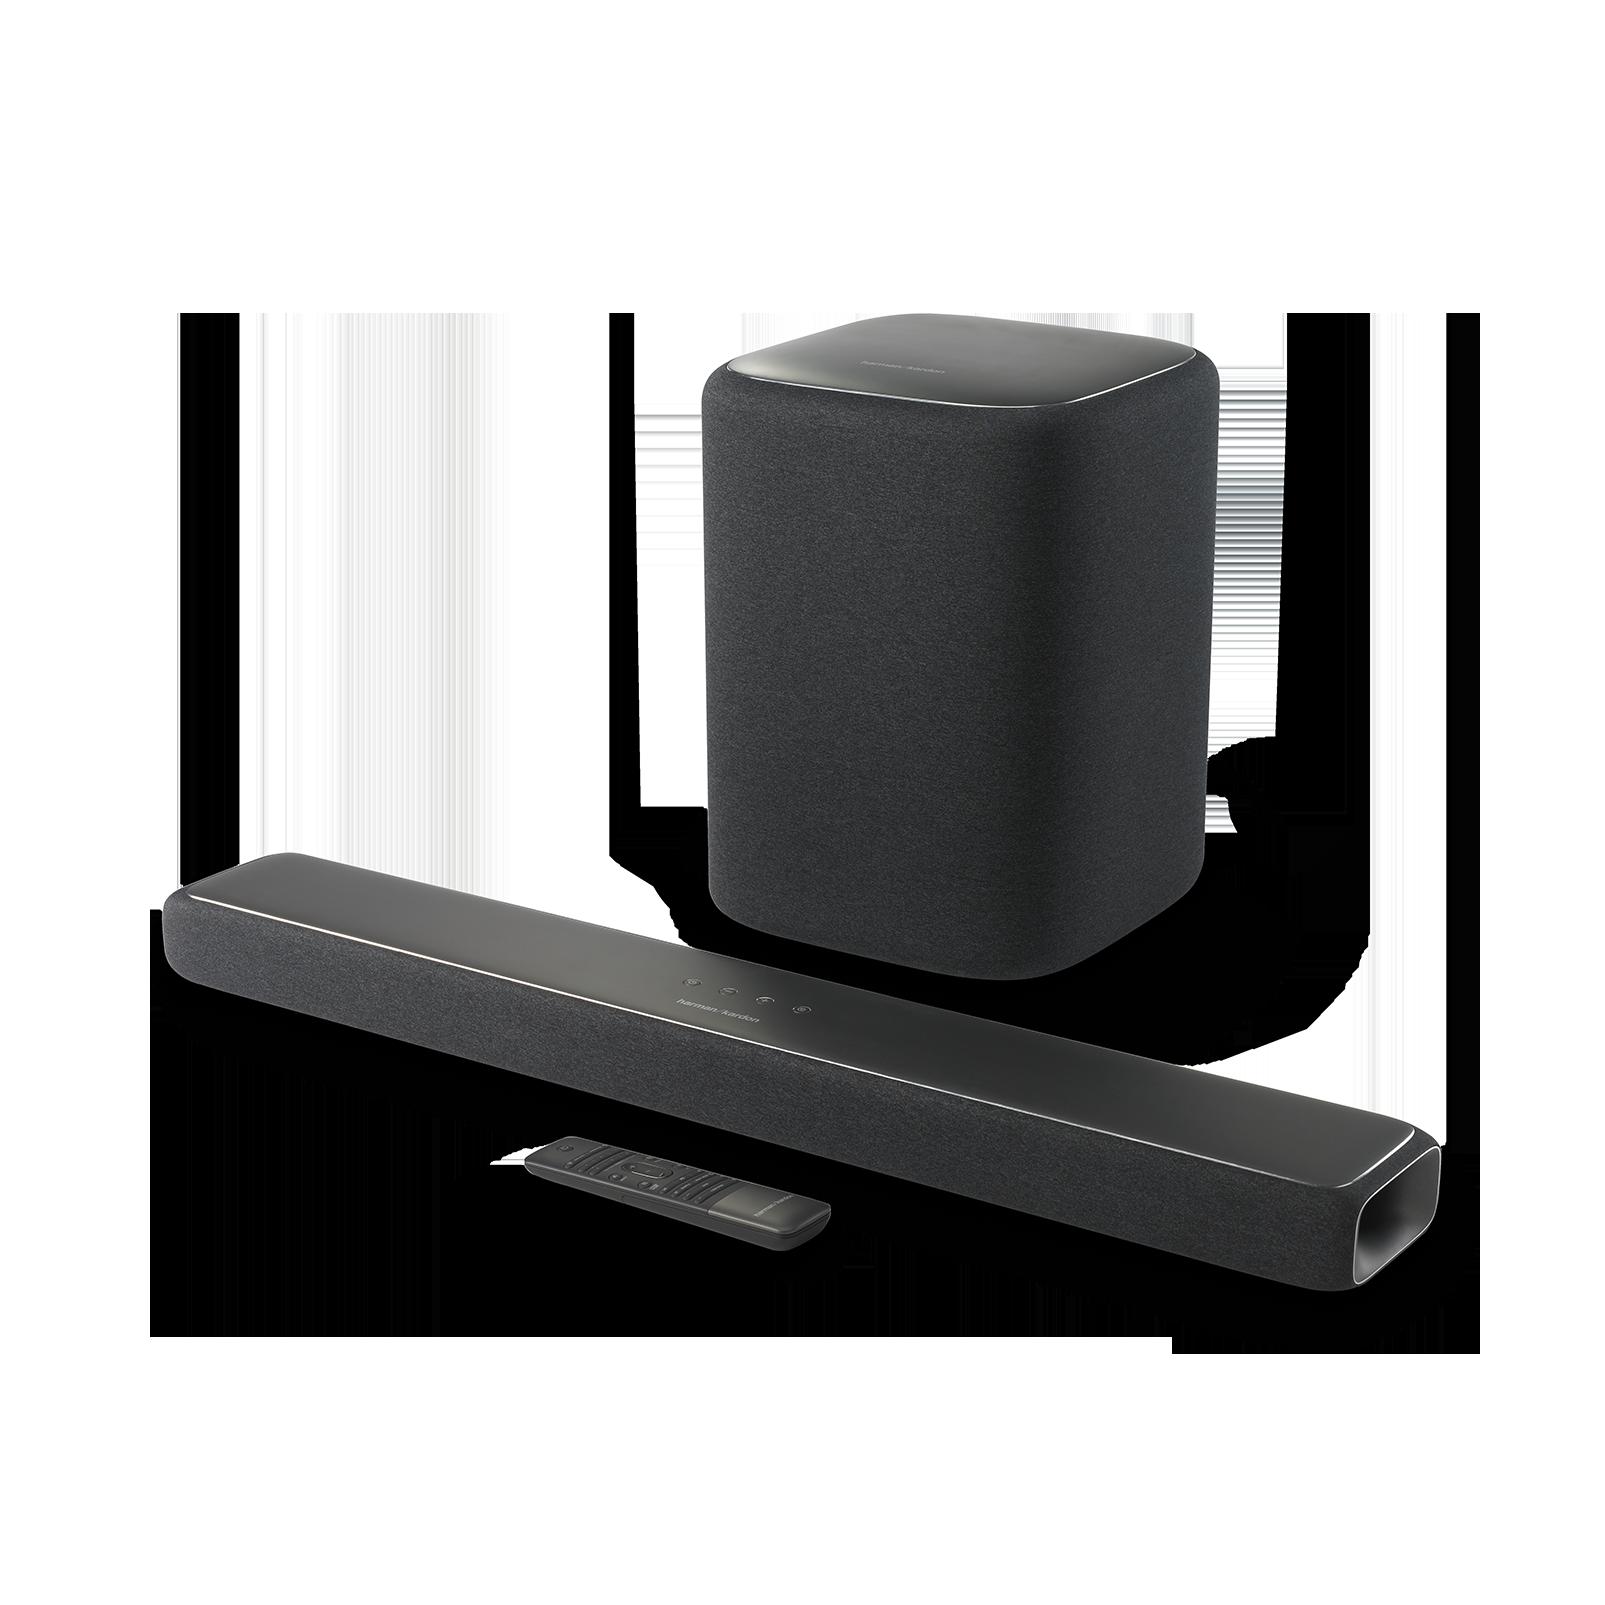 Enchant 800 - Graphite - All in One 8-Channel Soundbar with MultiBeam™ Surround Sound - Detailshot 1